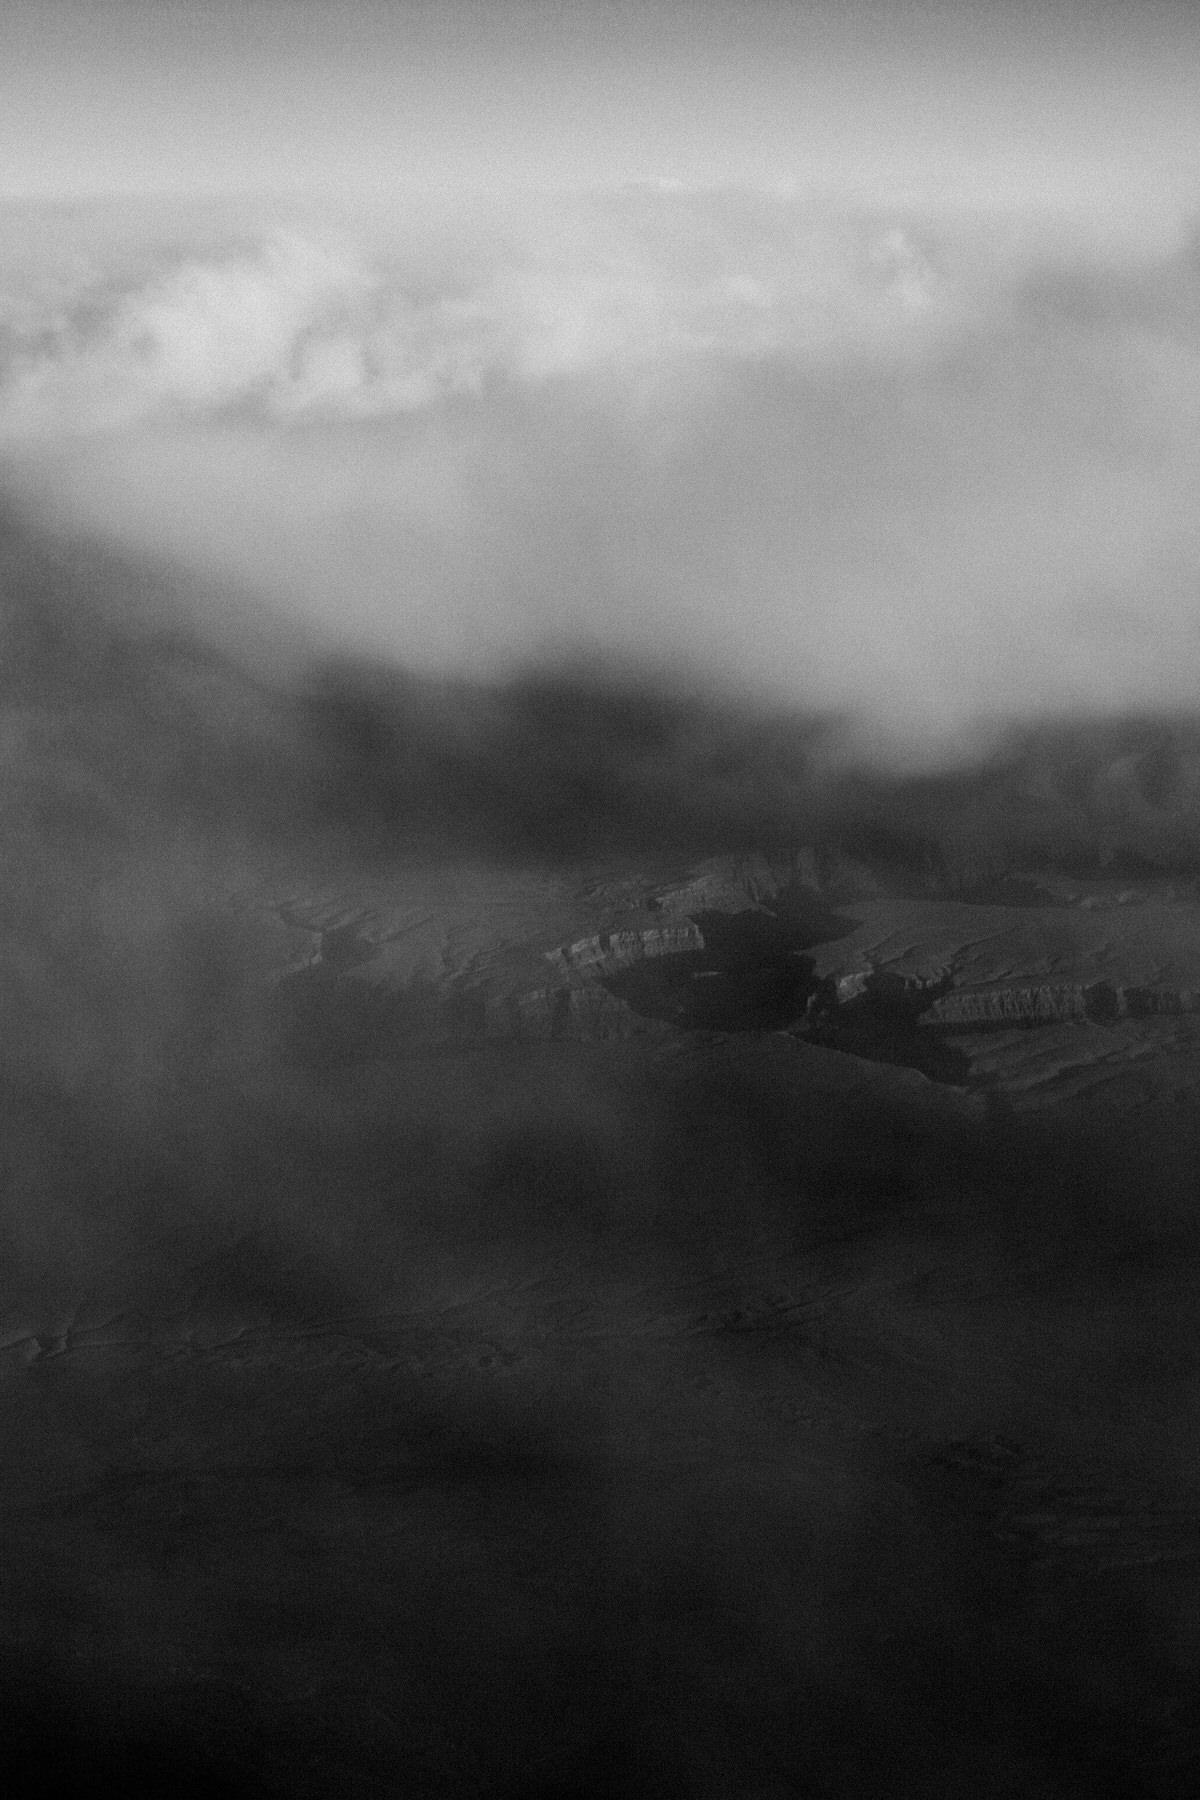 Grand-Canyon-Arizona-black-and-white-fine-art-photography-by-Studio-L-photographer-Laura-Schneider-_0709